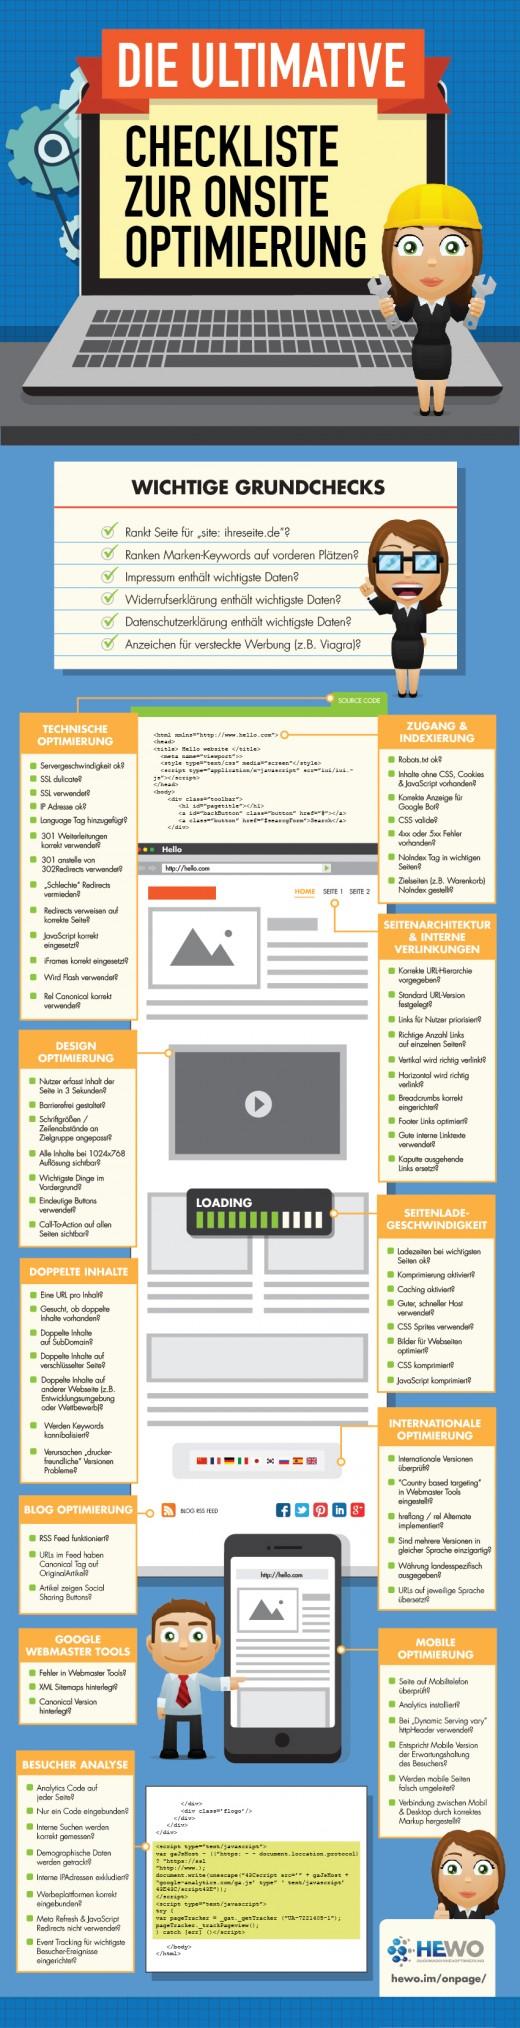 Onsite Optimierung Checkliste